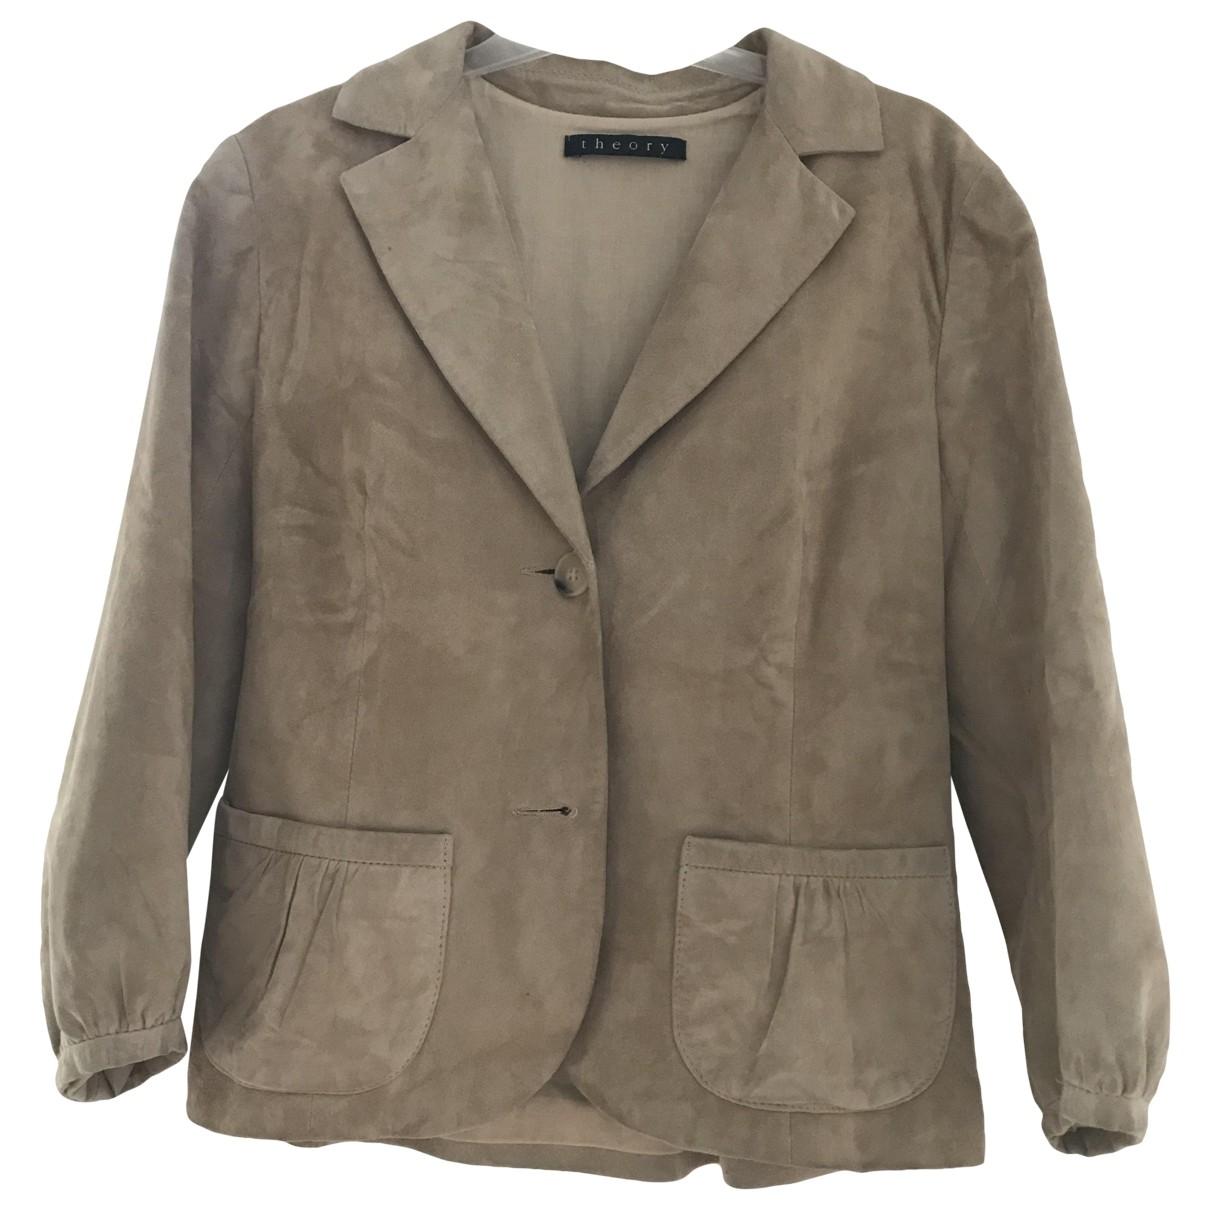 Theory \N Beige Suede jacket for Women 38 FR